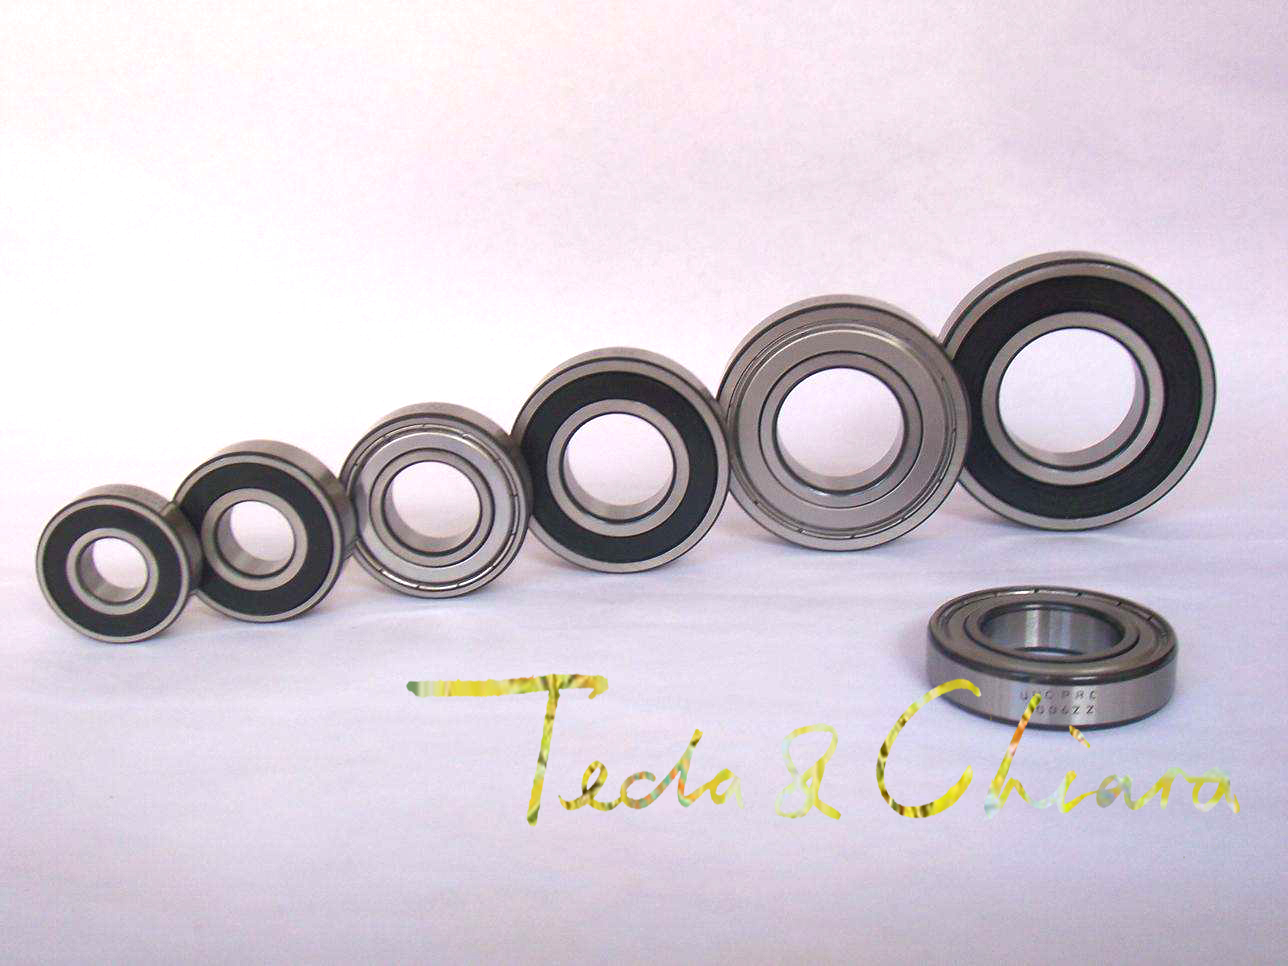 6003 6003ZZ 6003RS 6003-2Z 6003Z 6003-2RS ZZ RS RZ 2RZ Deep Groove Ball Bearings 17 x 35 x 10mm High Quality 6003 zz p5 z2 motor bearings for high speed precision cnc machine tool bearings deep groove ball bearing seals